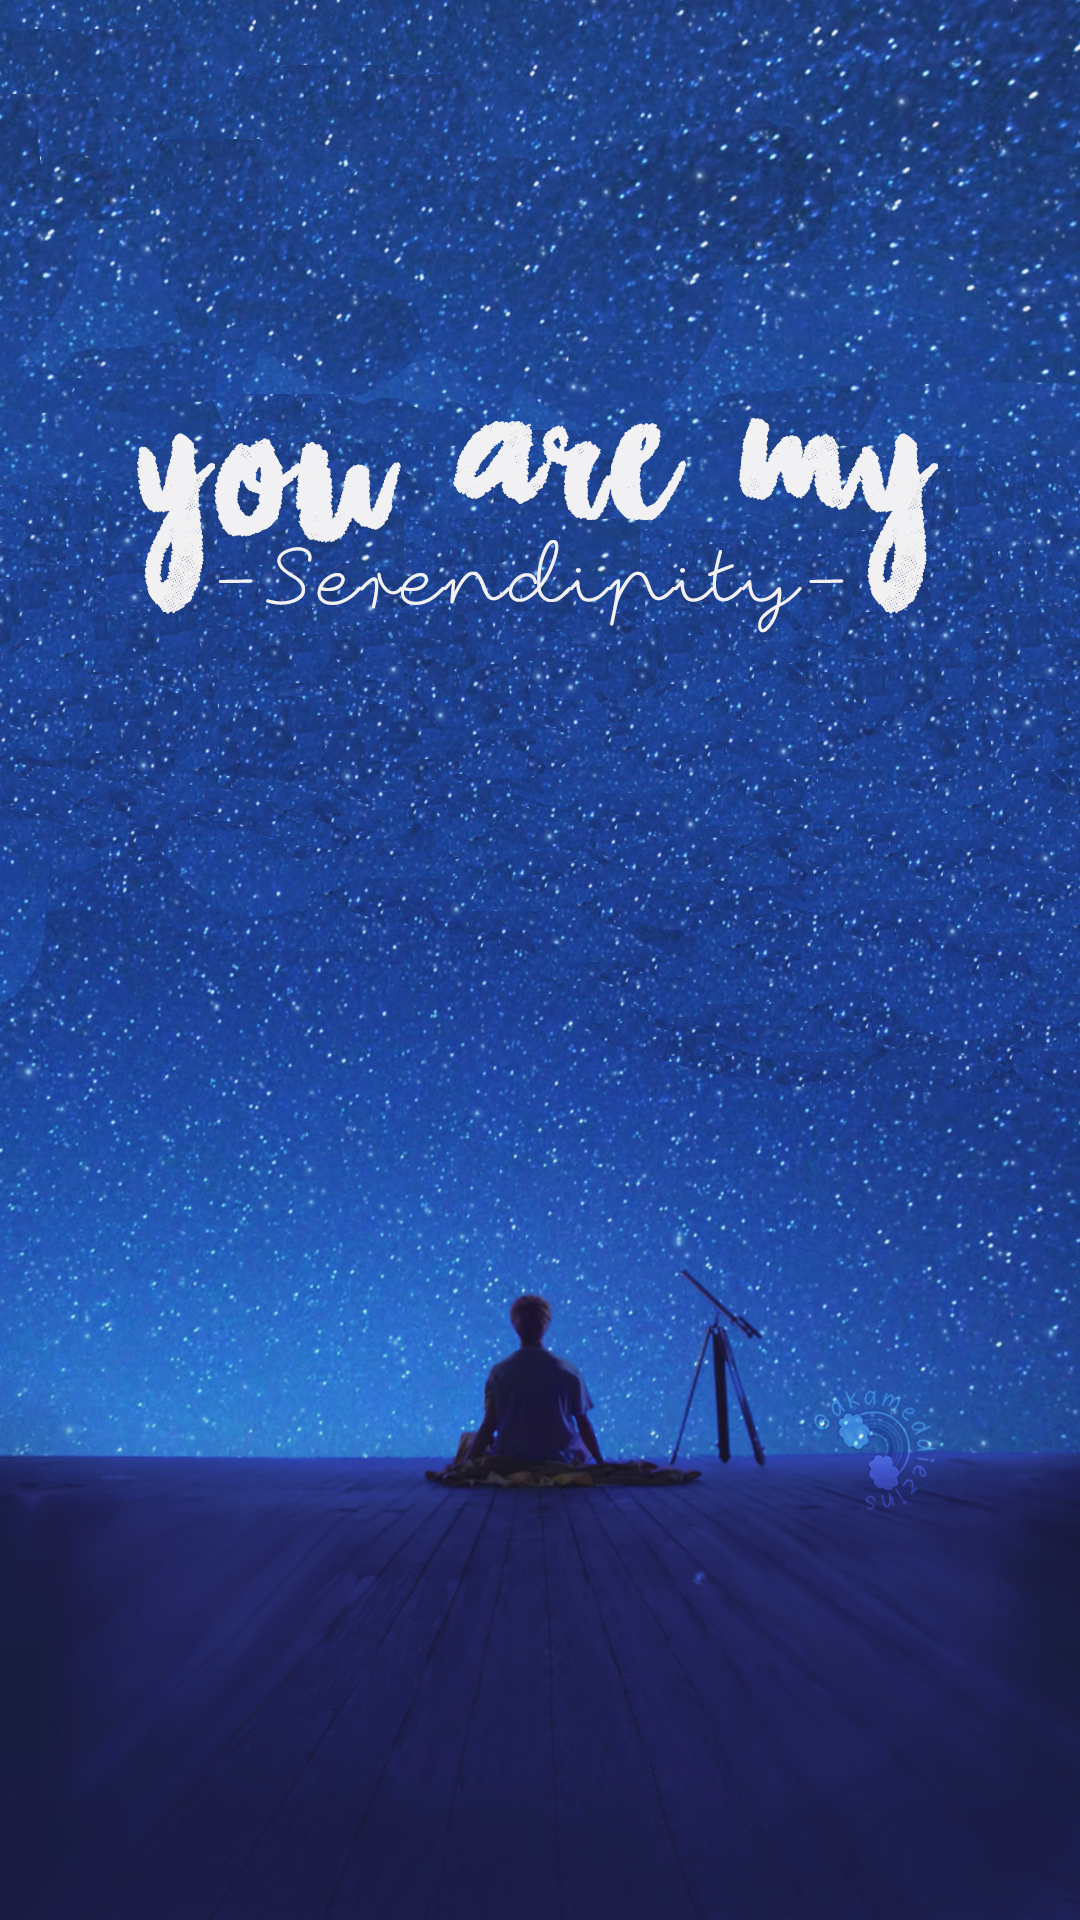 Serendipity Lyrics Bts Wallpaper Wallpapers Imgurl